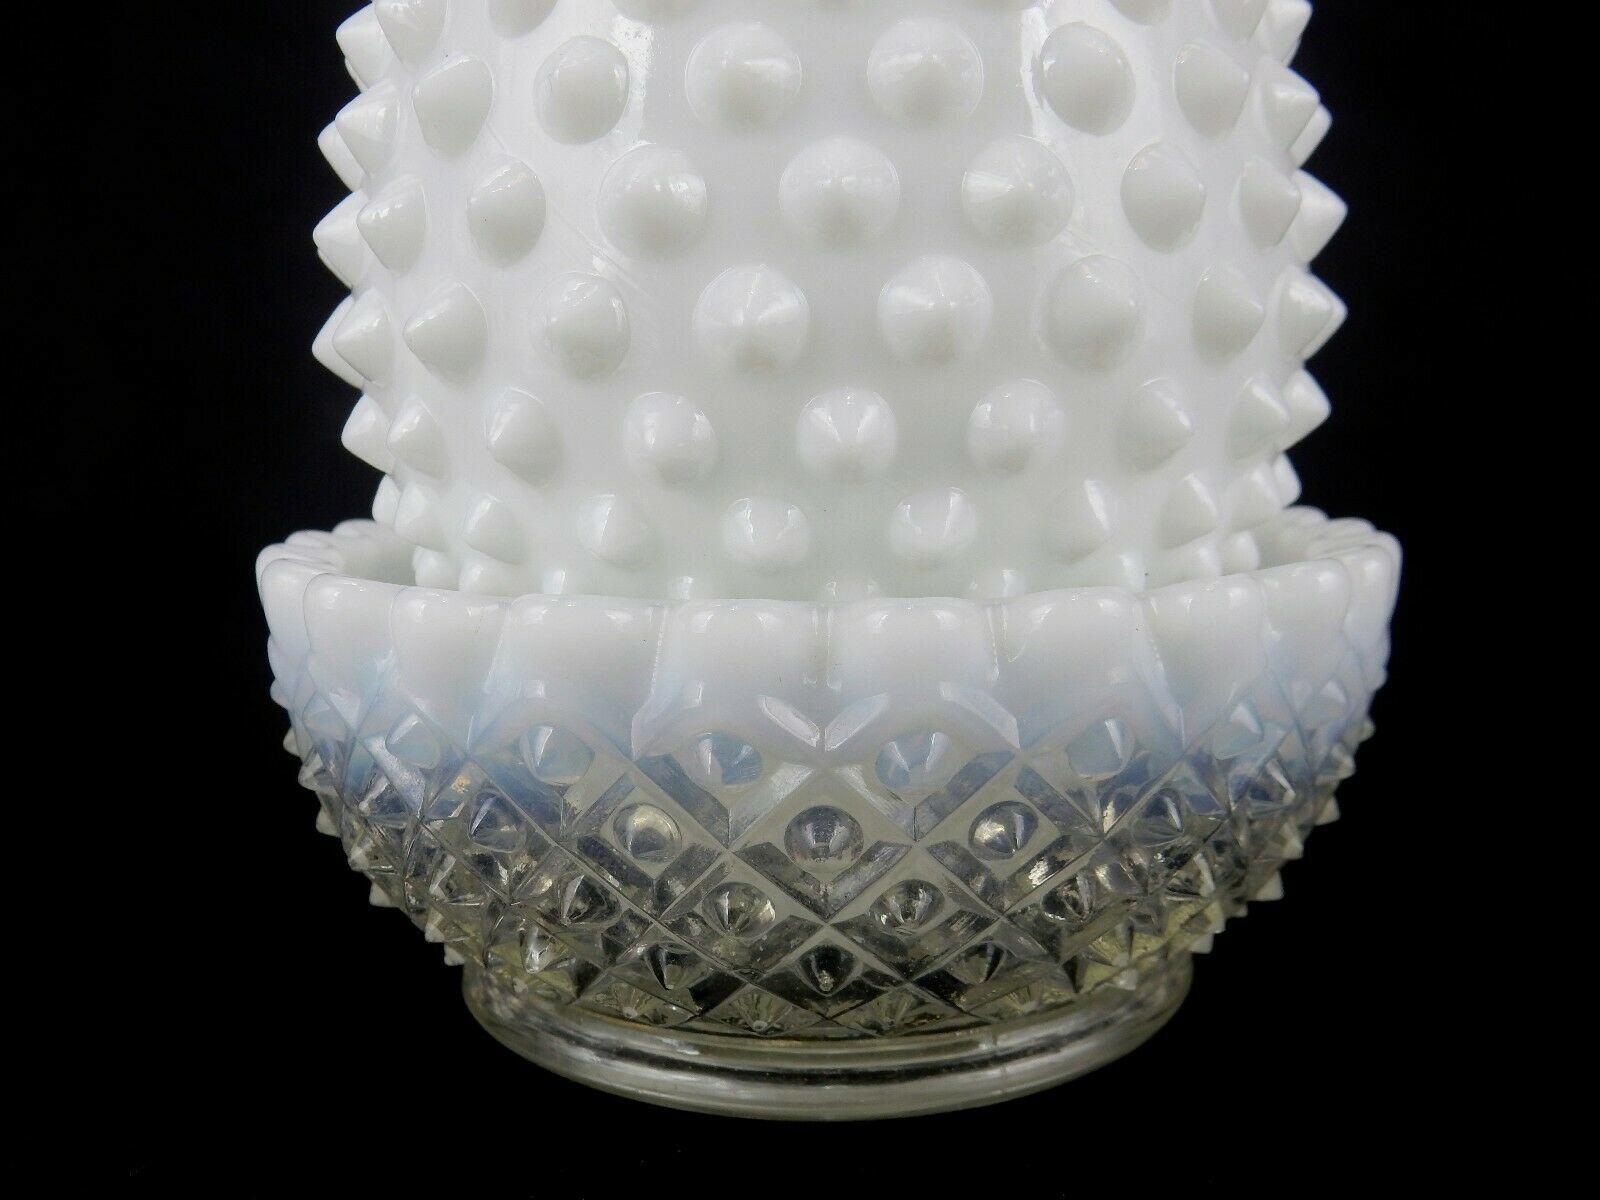 Fenton Candle Holders, White Hobnail Milk Glass Hurricane,Modern Farmhouse Decor